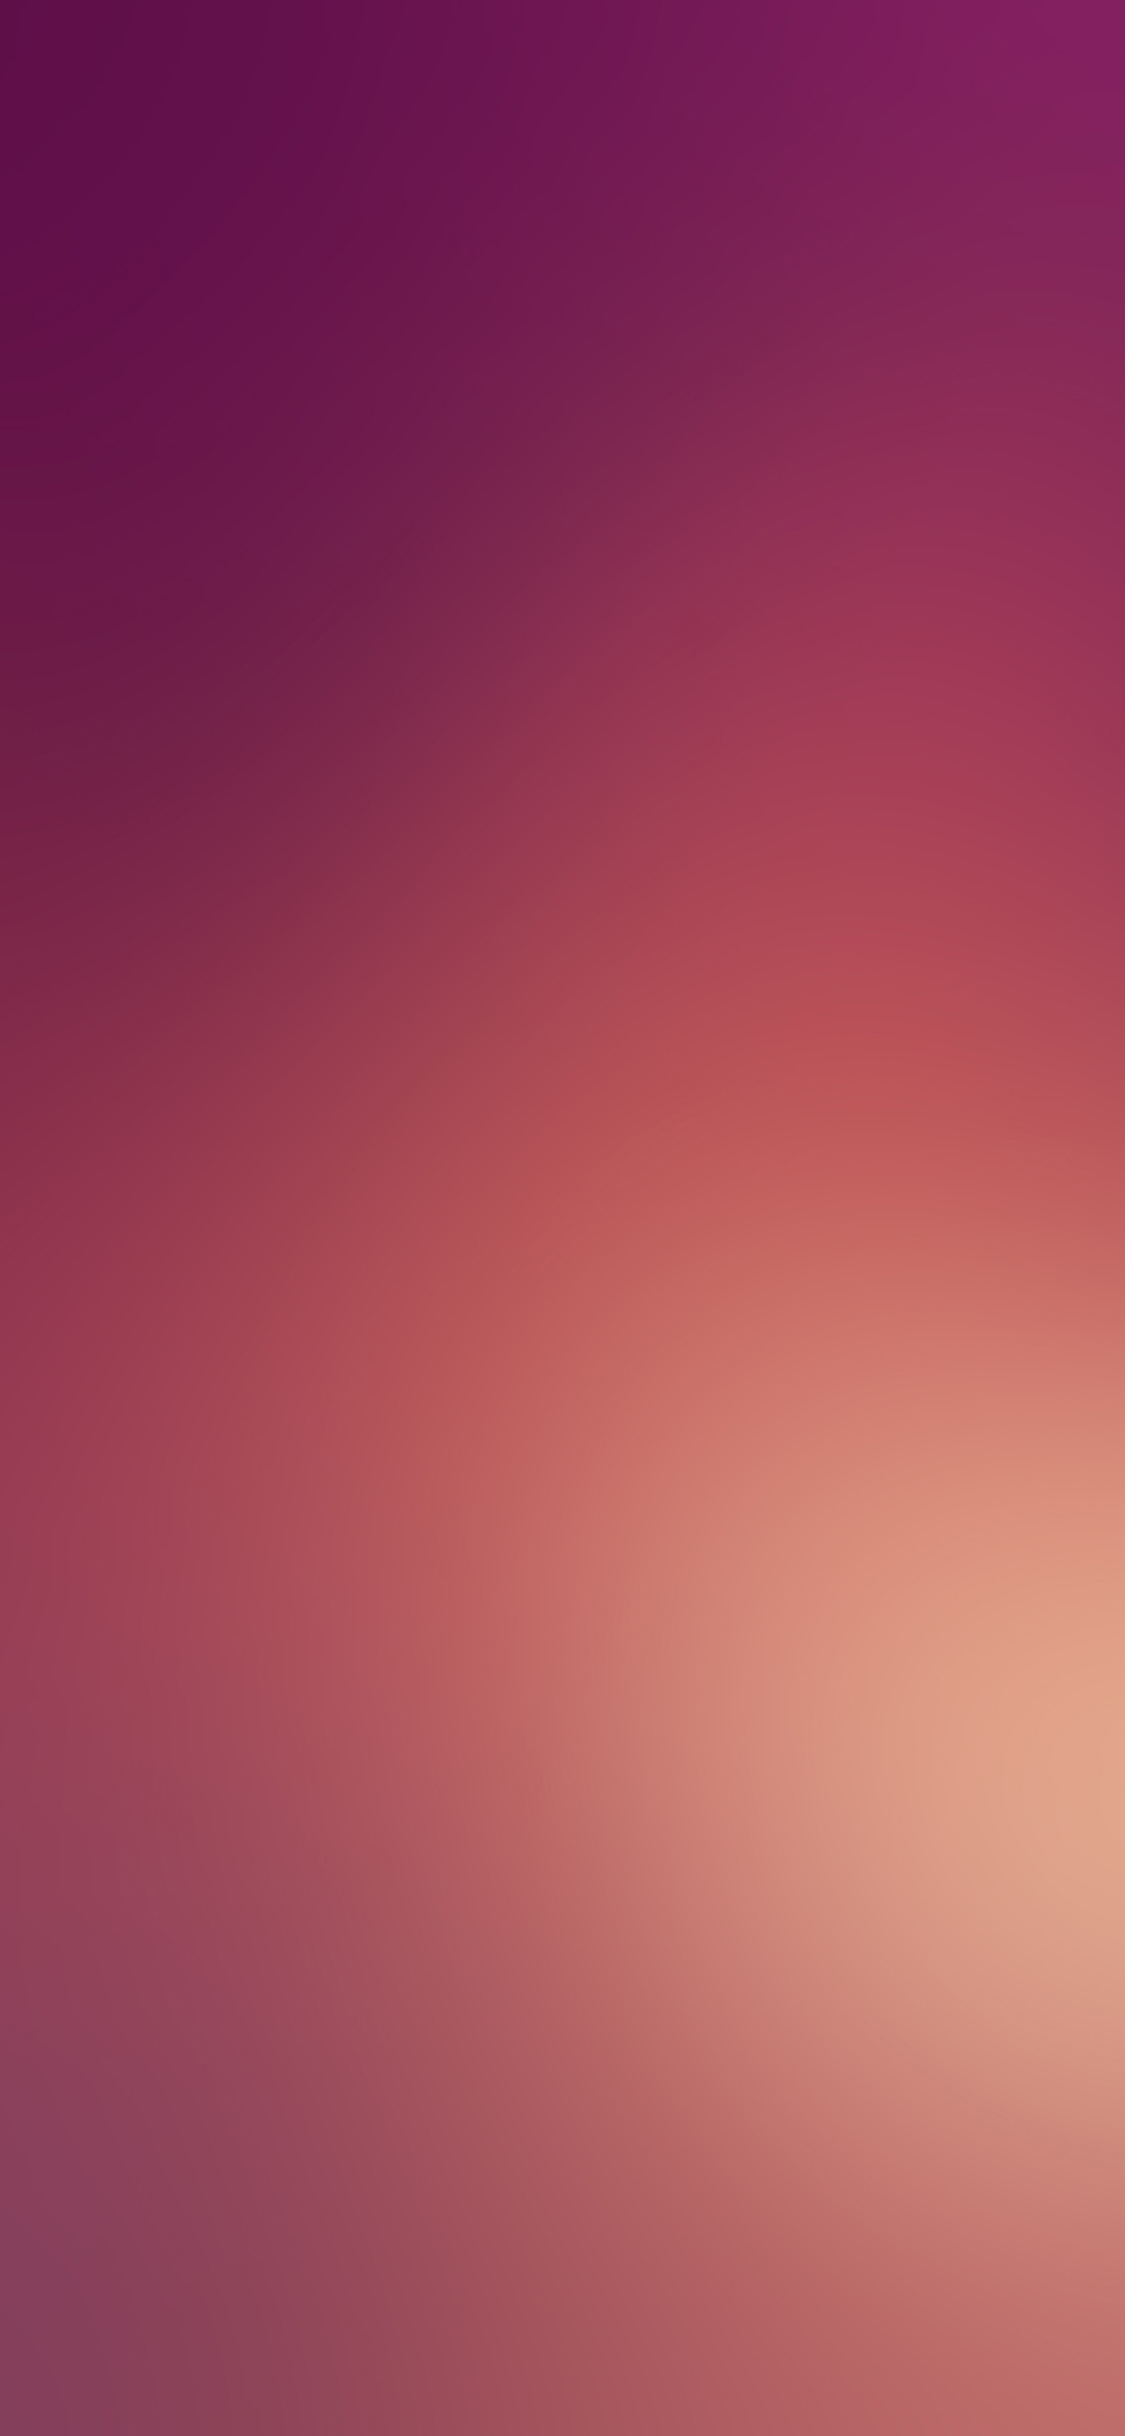 iPhoneXpapers.com-Apple-iPhone-wallpaper-sc25-violet-peace-love-blur